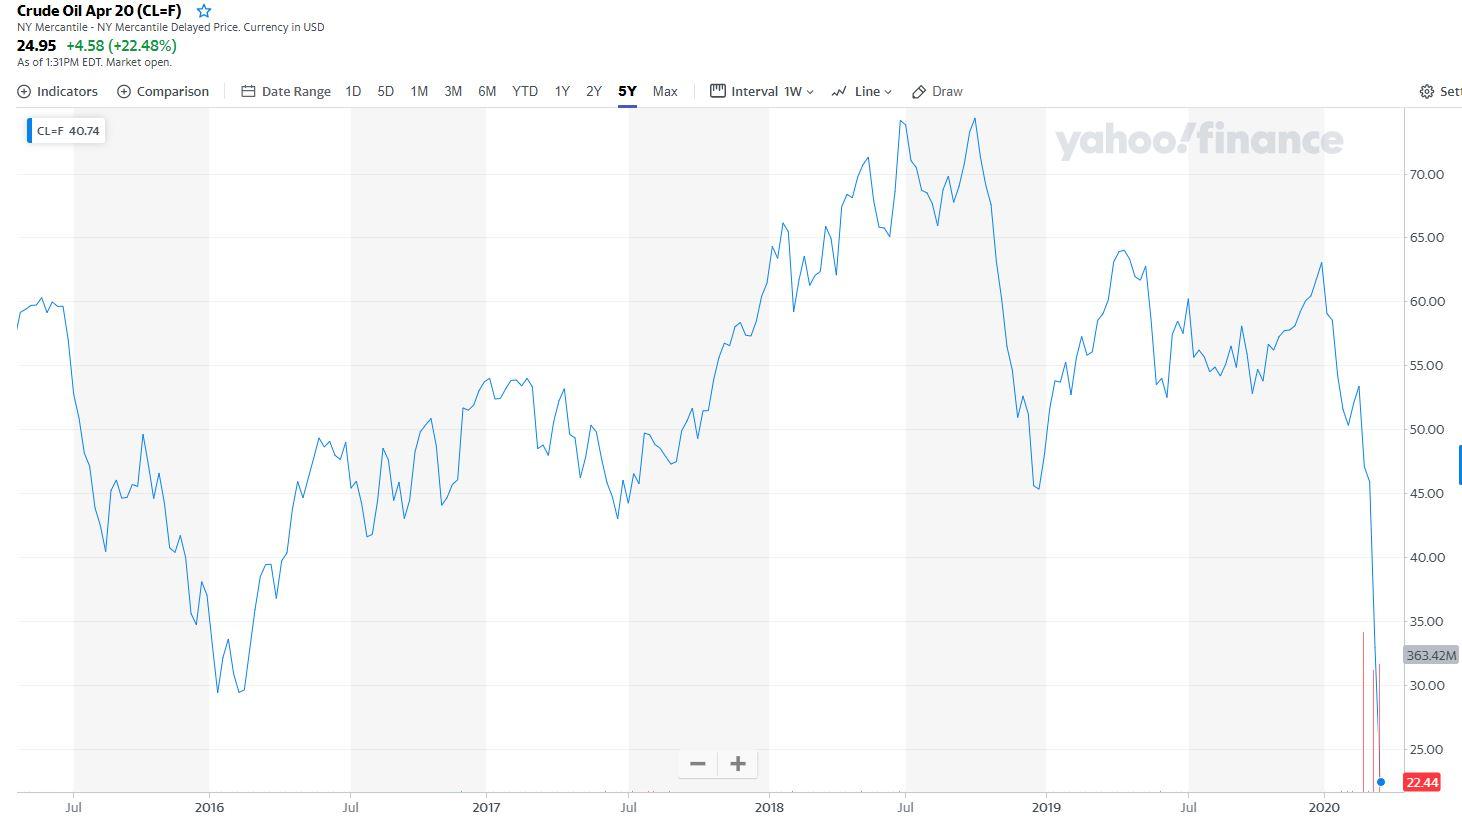 Crude oil preços